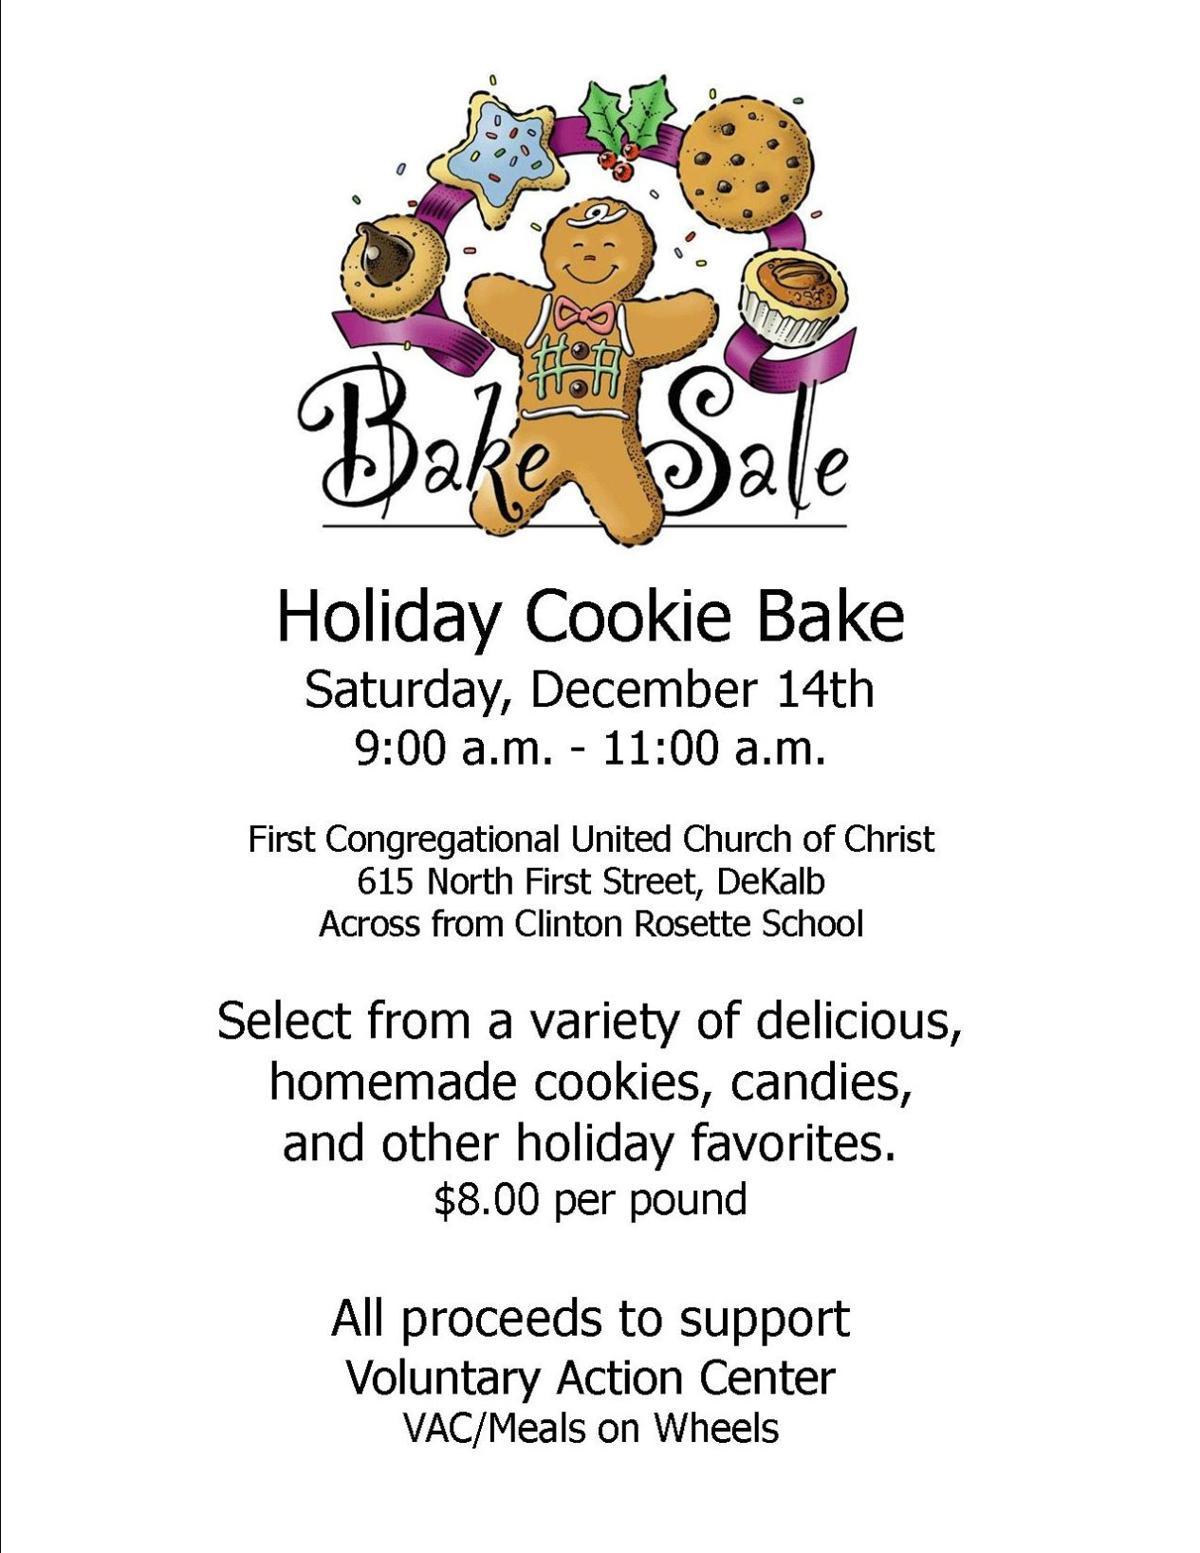 Cookie Bake Flyer